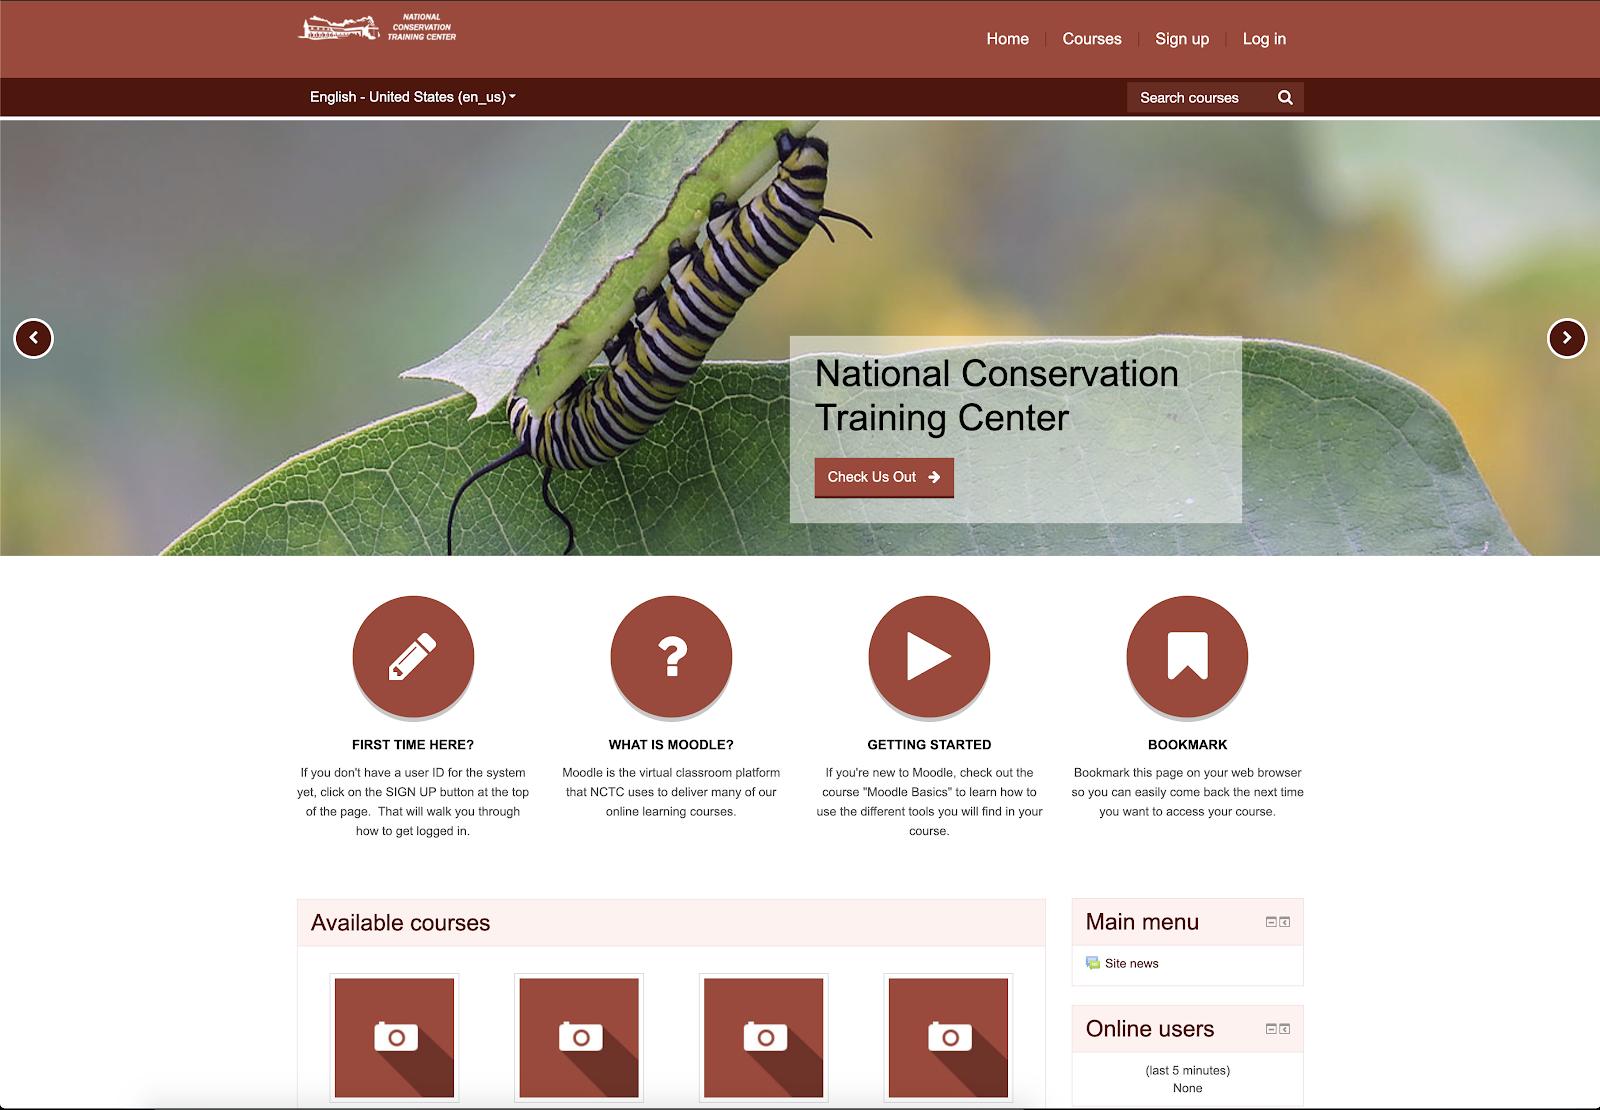 National Conservation Training Center